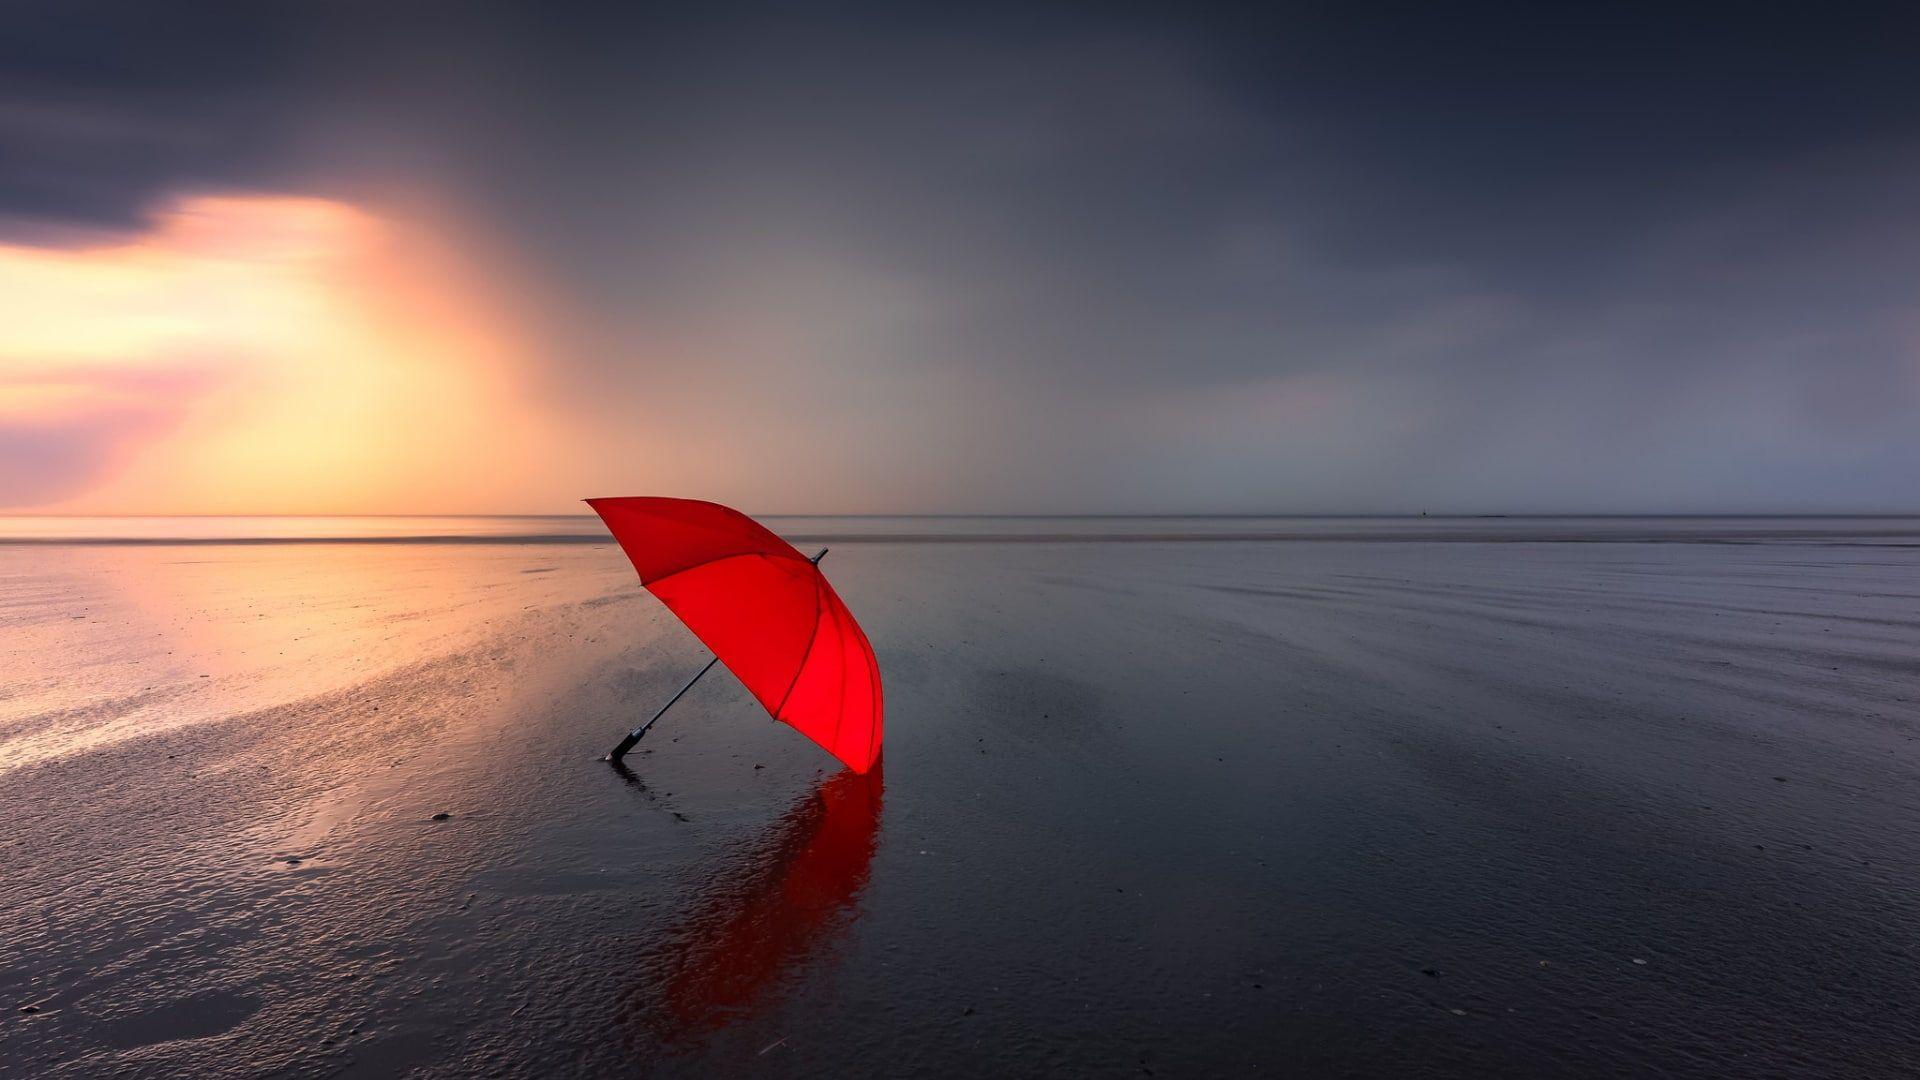 Umbrella Red Umbrella Sea Beach Horizon Cloudy Photography 1080p Wallpaper Hdwallpaper Desktop Umbrella Photography Red Umbrella Cloudy Photography